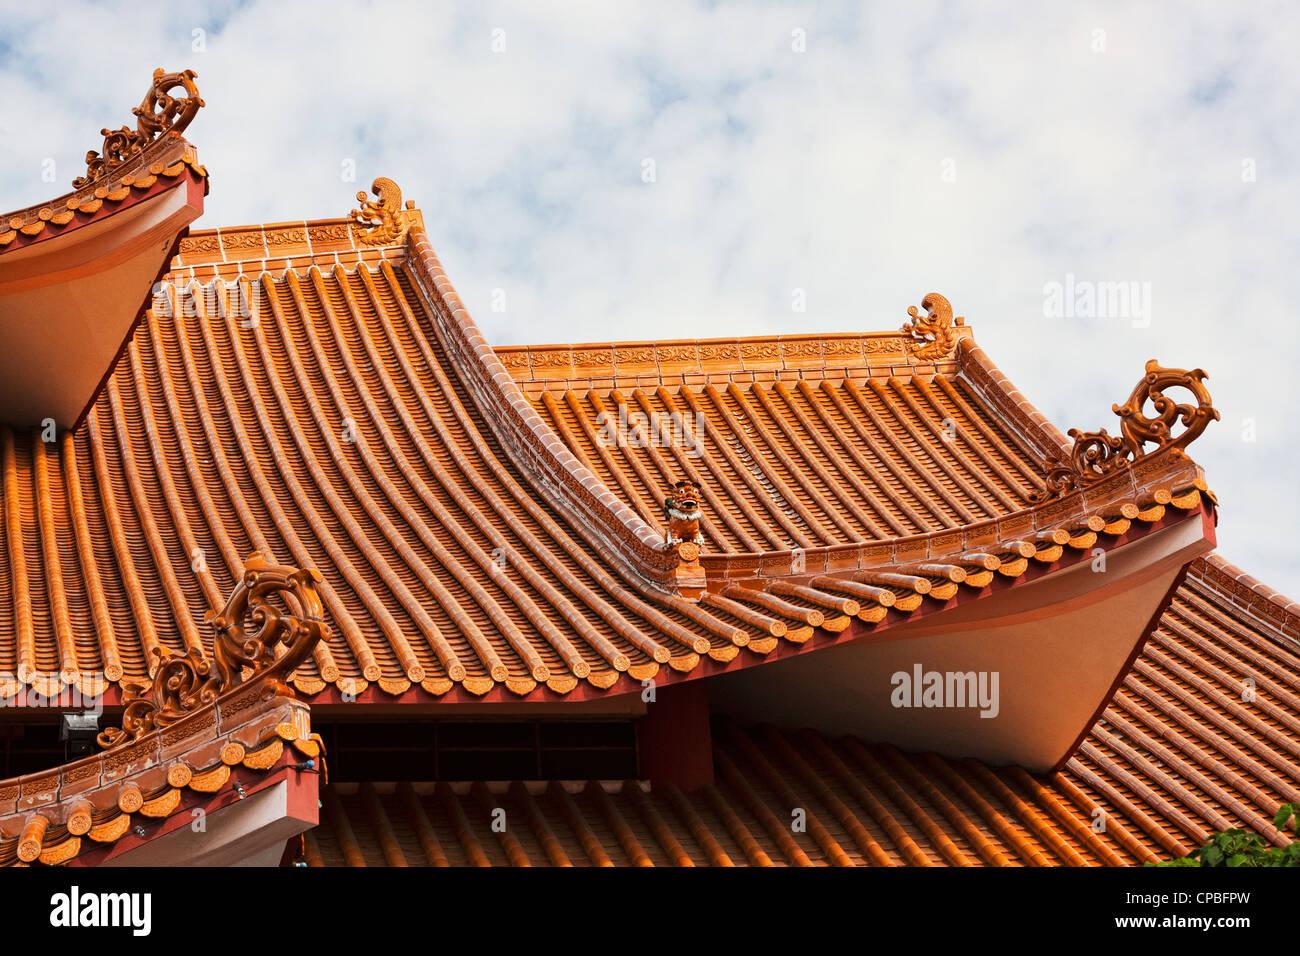 Temple roof, Kota Kinabalu - Stock Image